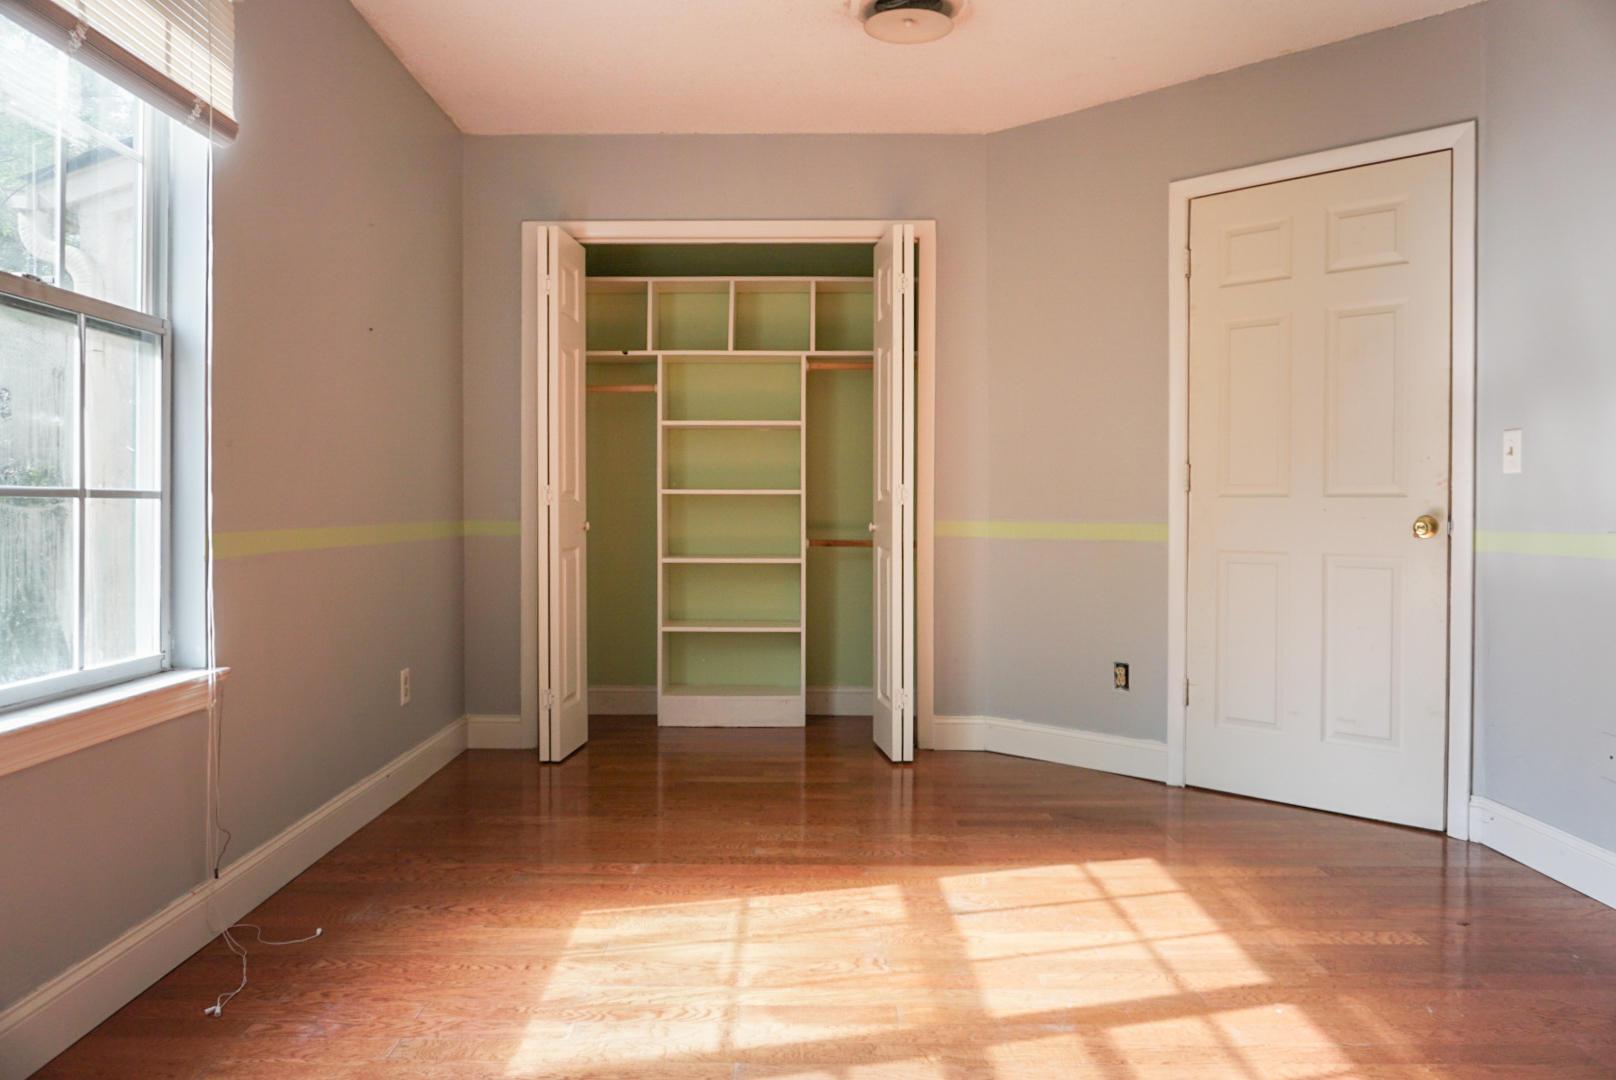 Beaumont Homes For Sale - 2097 Emerald, Mount Pleasant, SC - 8